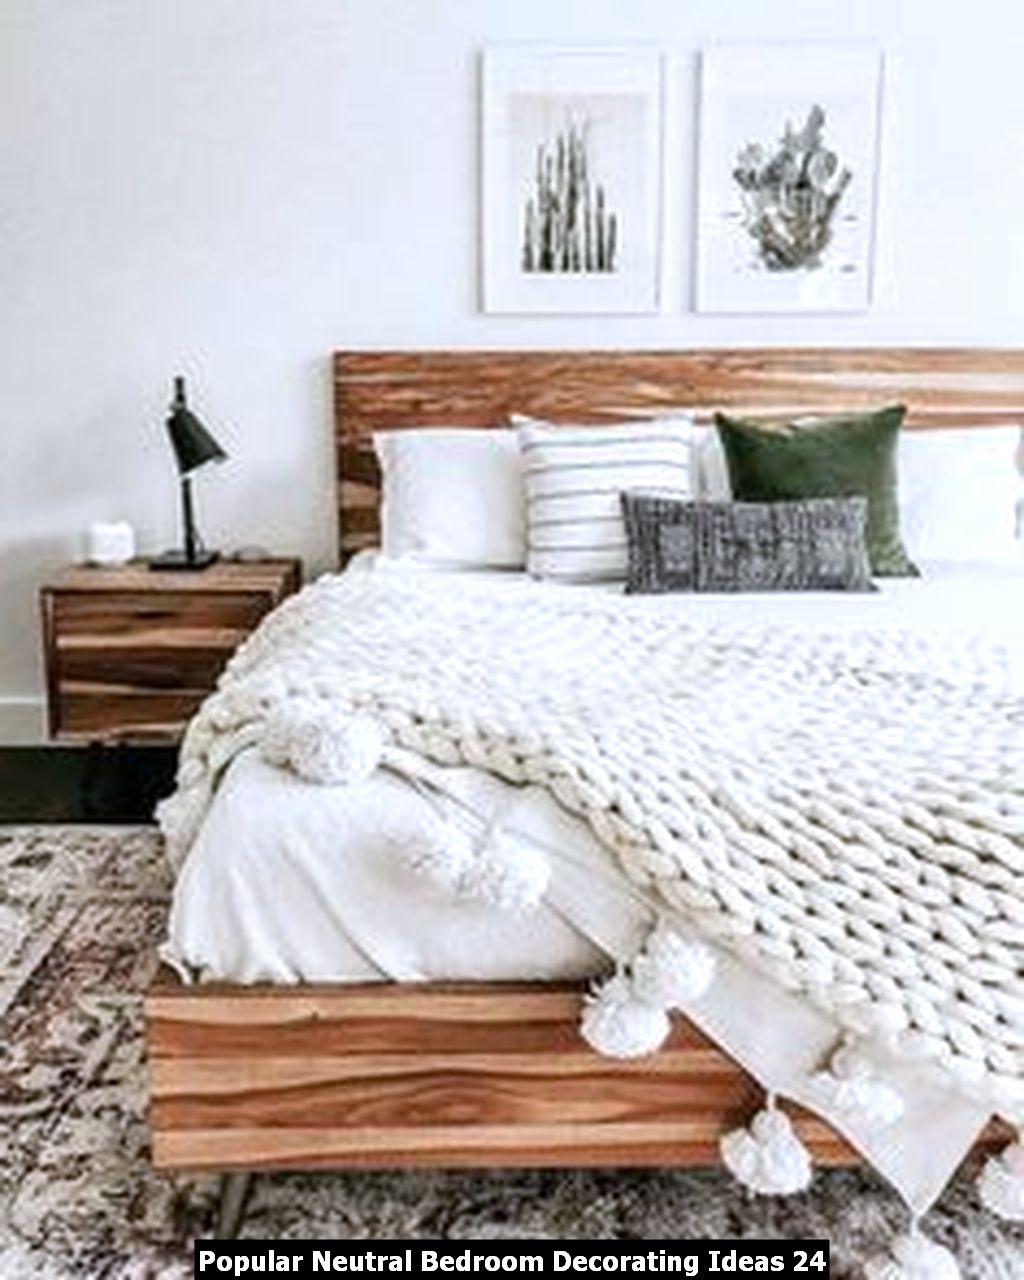 Popular Neutral Bedroom Decorating Ideas 24